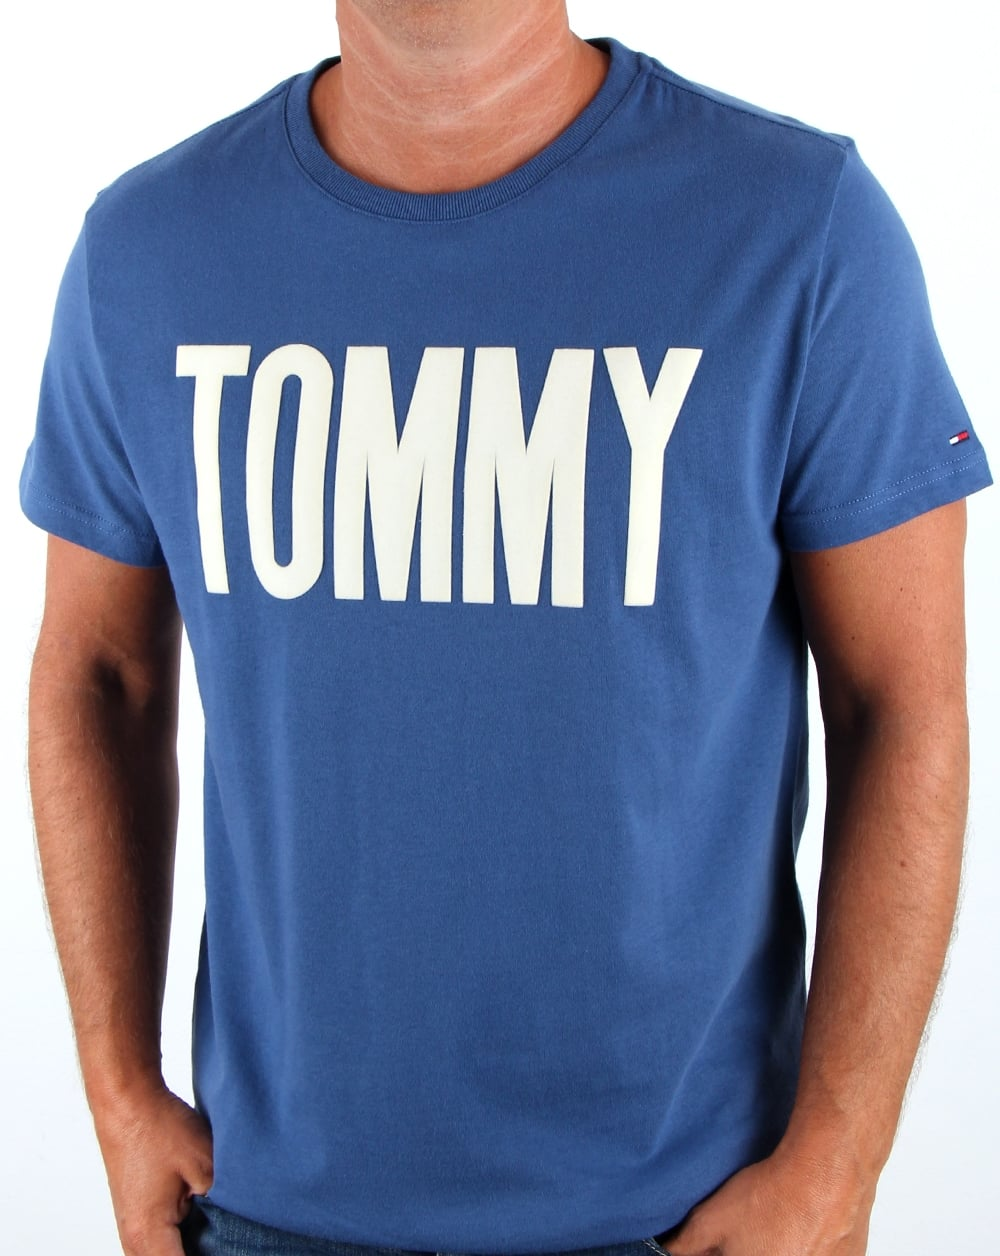 Tommy Hilfiger Mens Polo Shirts